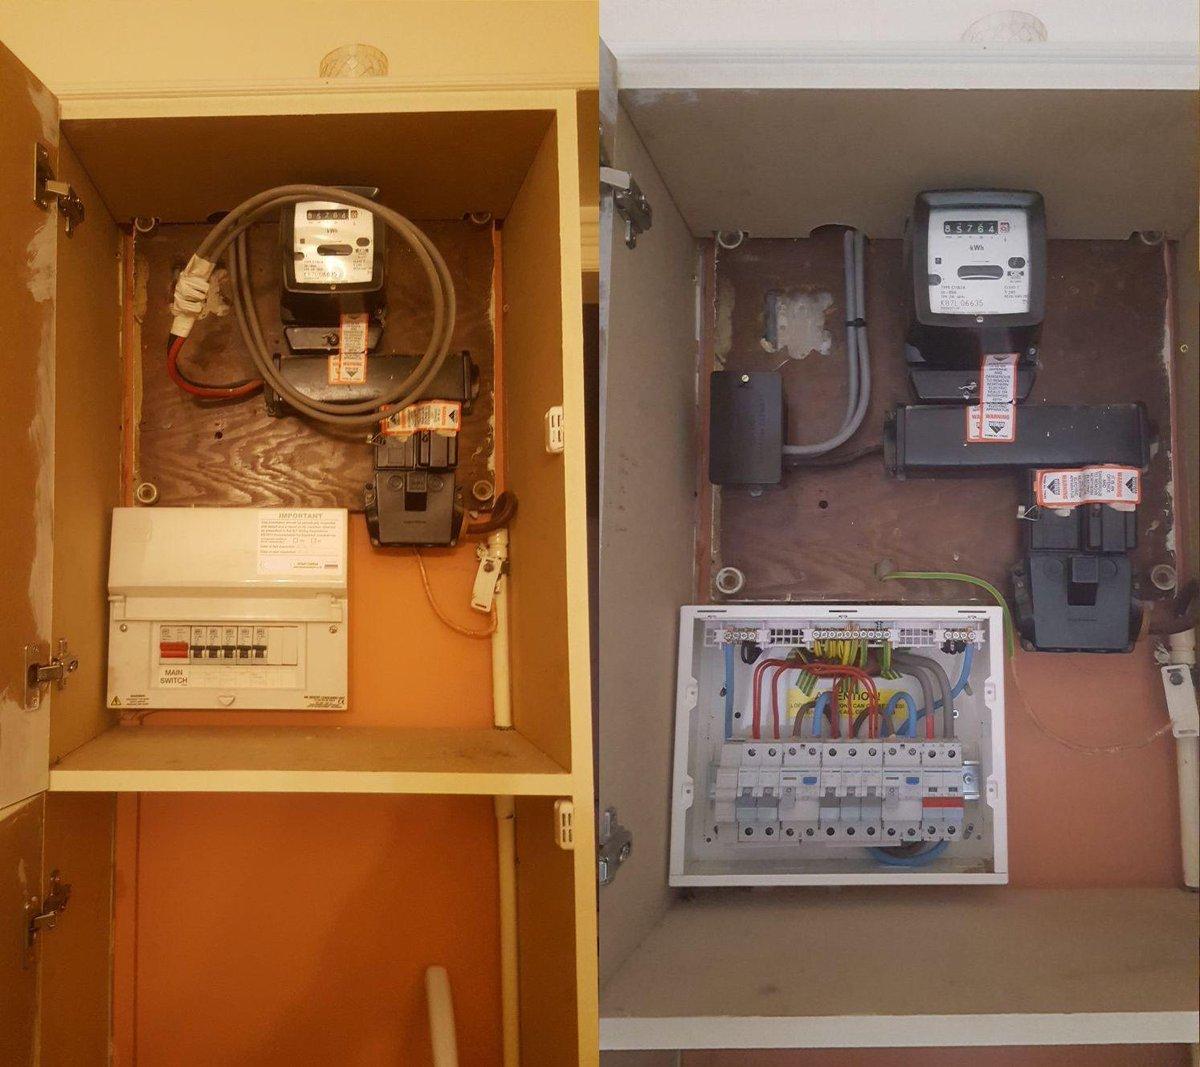 Tower Electrics Ltd Twitter Wiring Dual Rcd Consumer Unit 0 Replies Retweets Likes